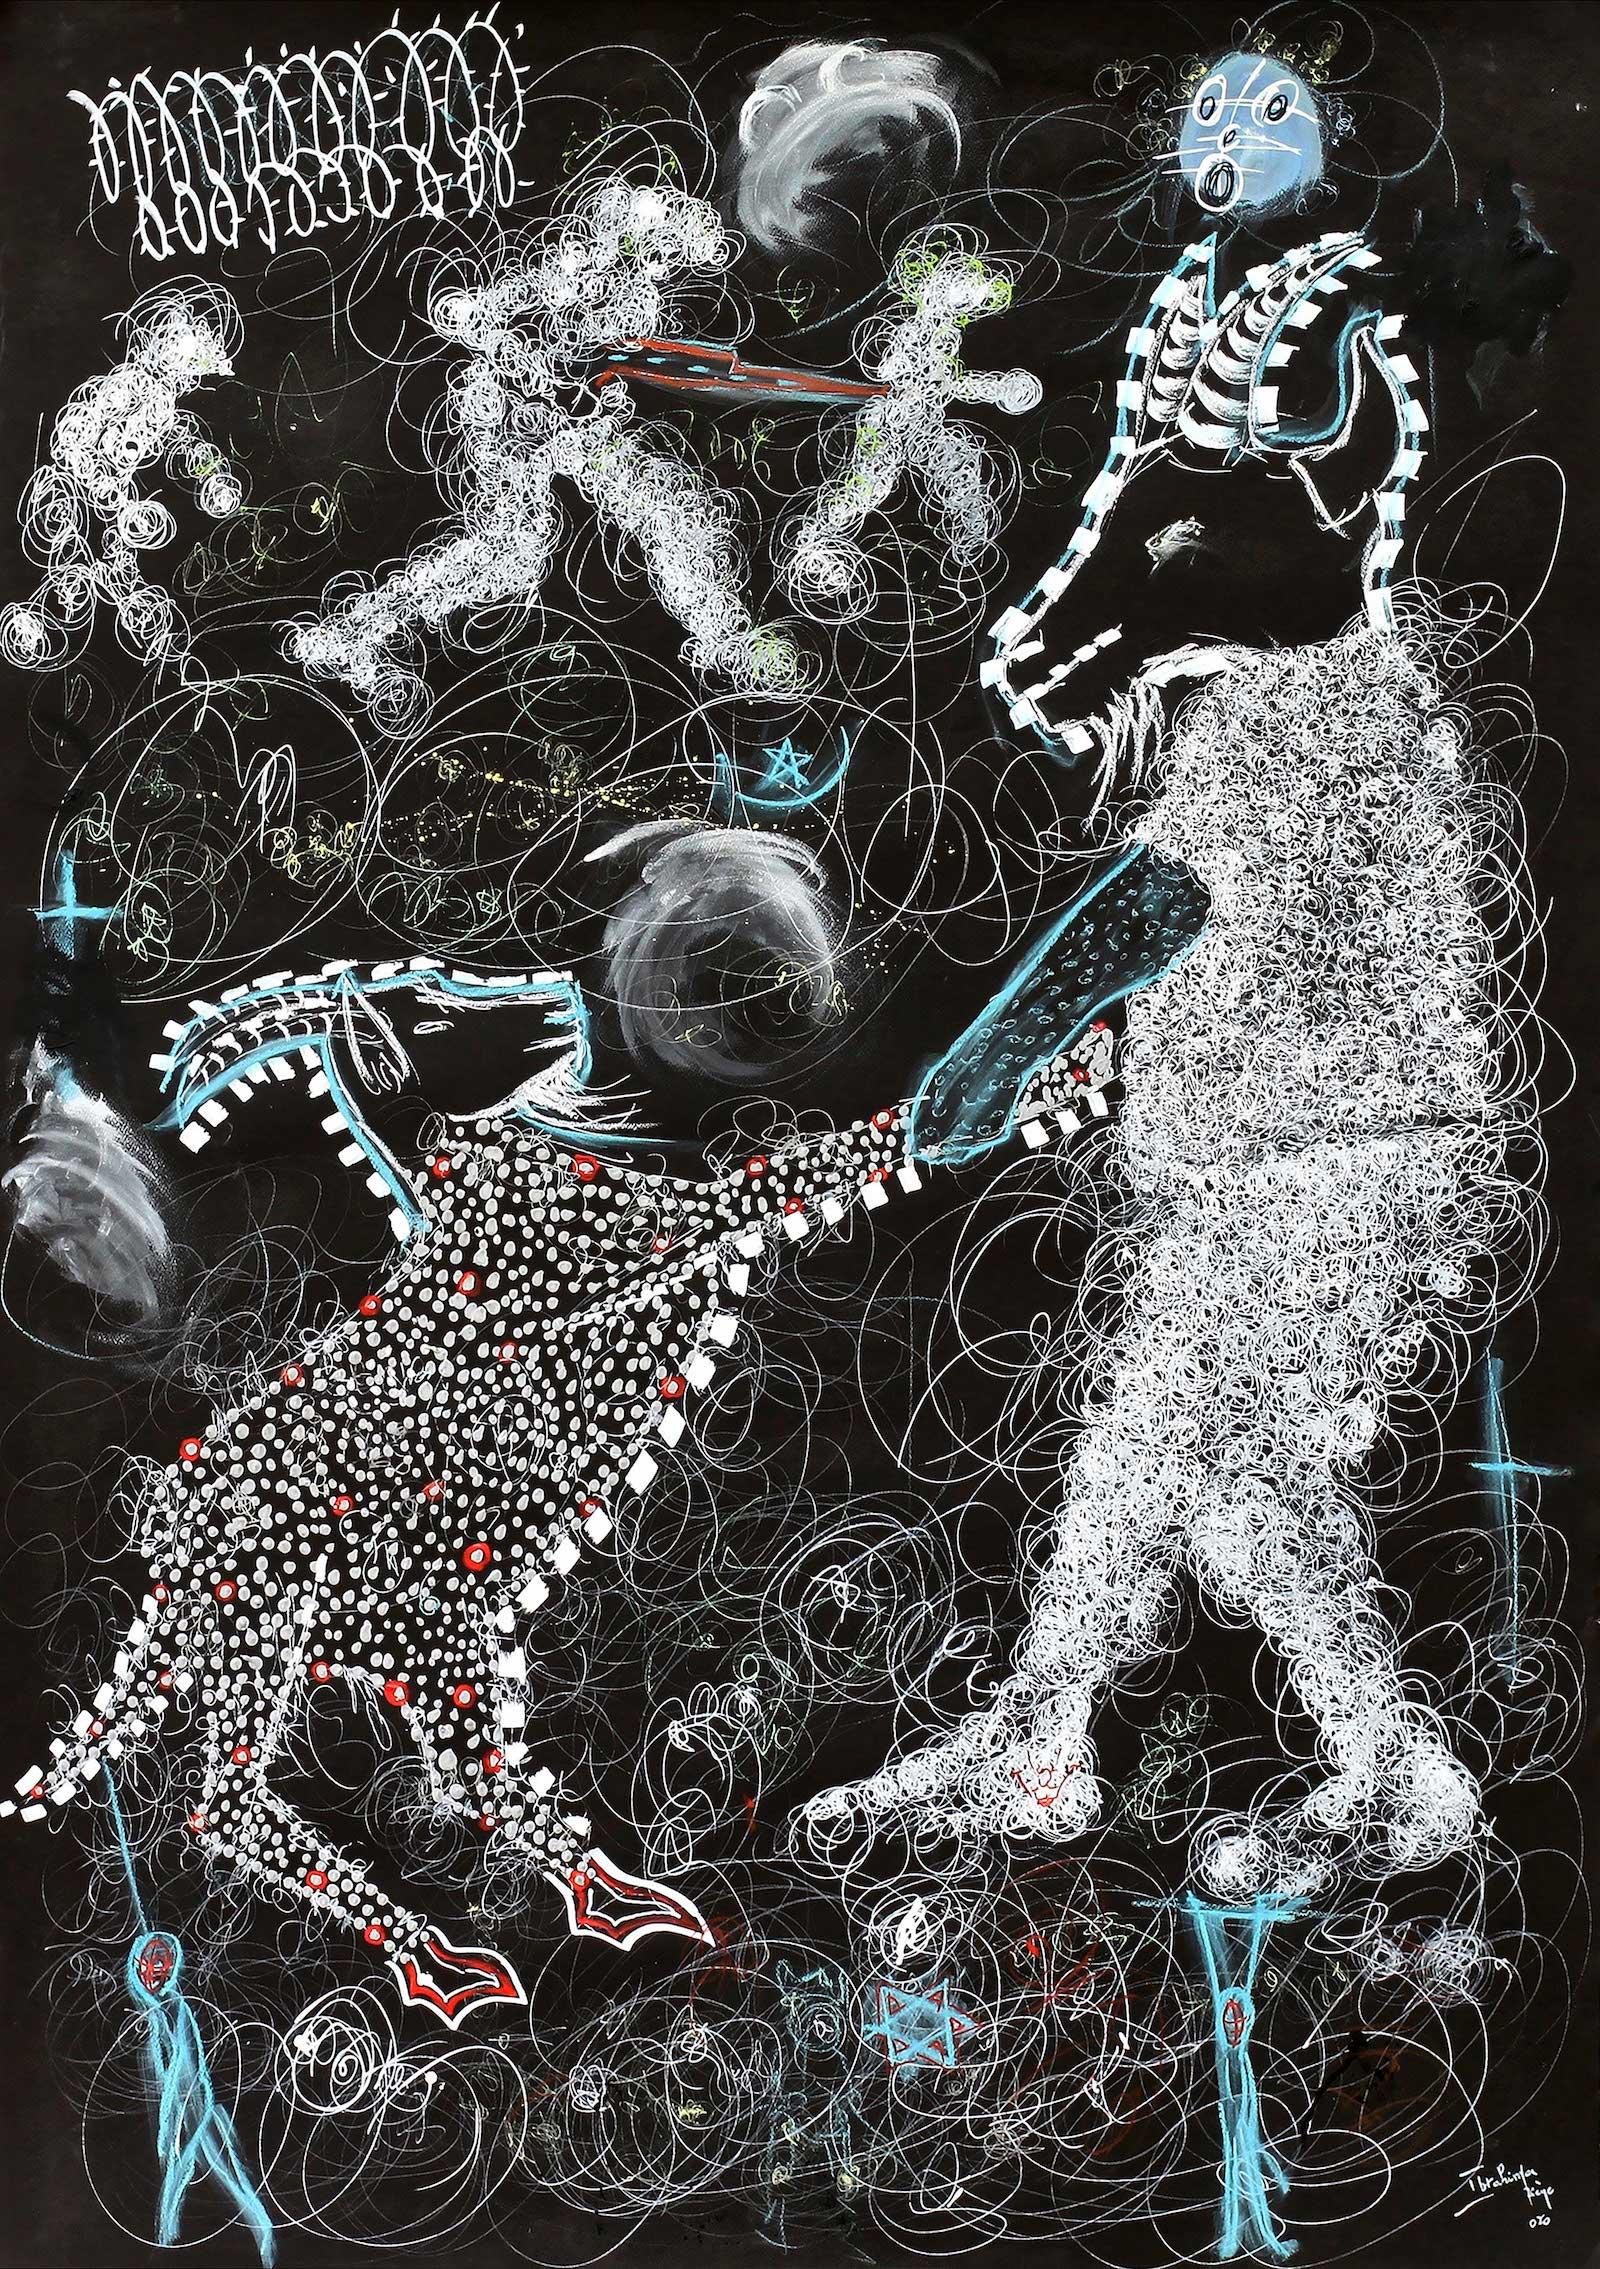 Serigne Ibrahima Dieye, 2_1. Sacrifice3. Courtesy Galerie Cécile Fakhoury